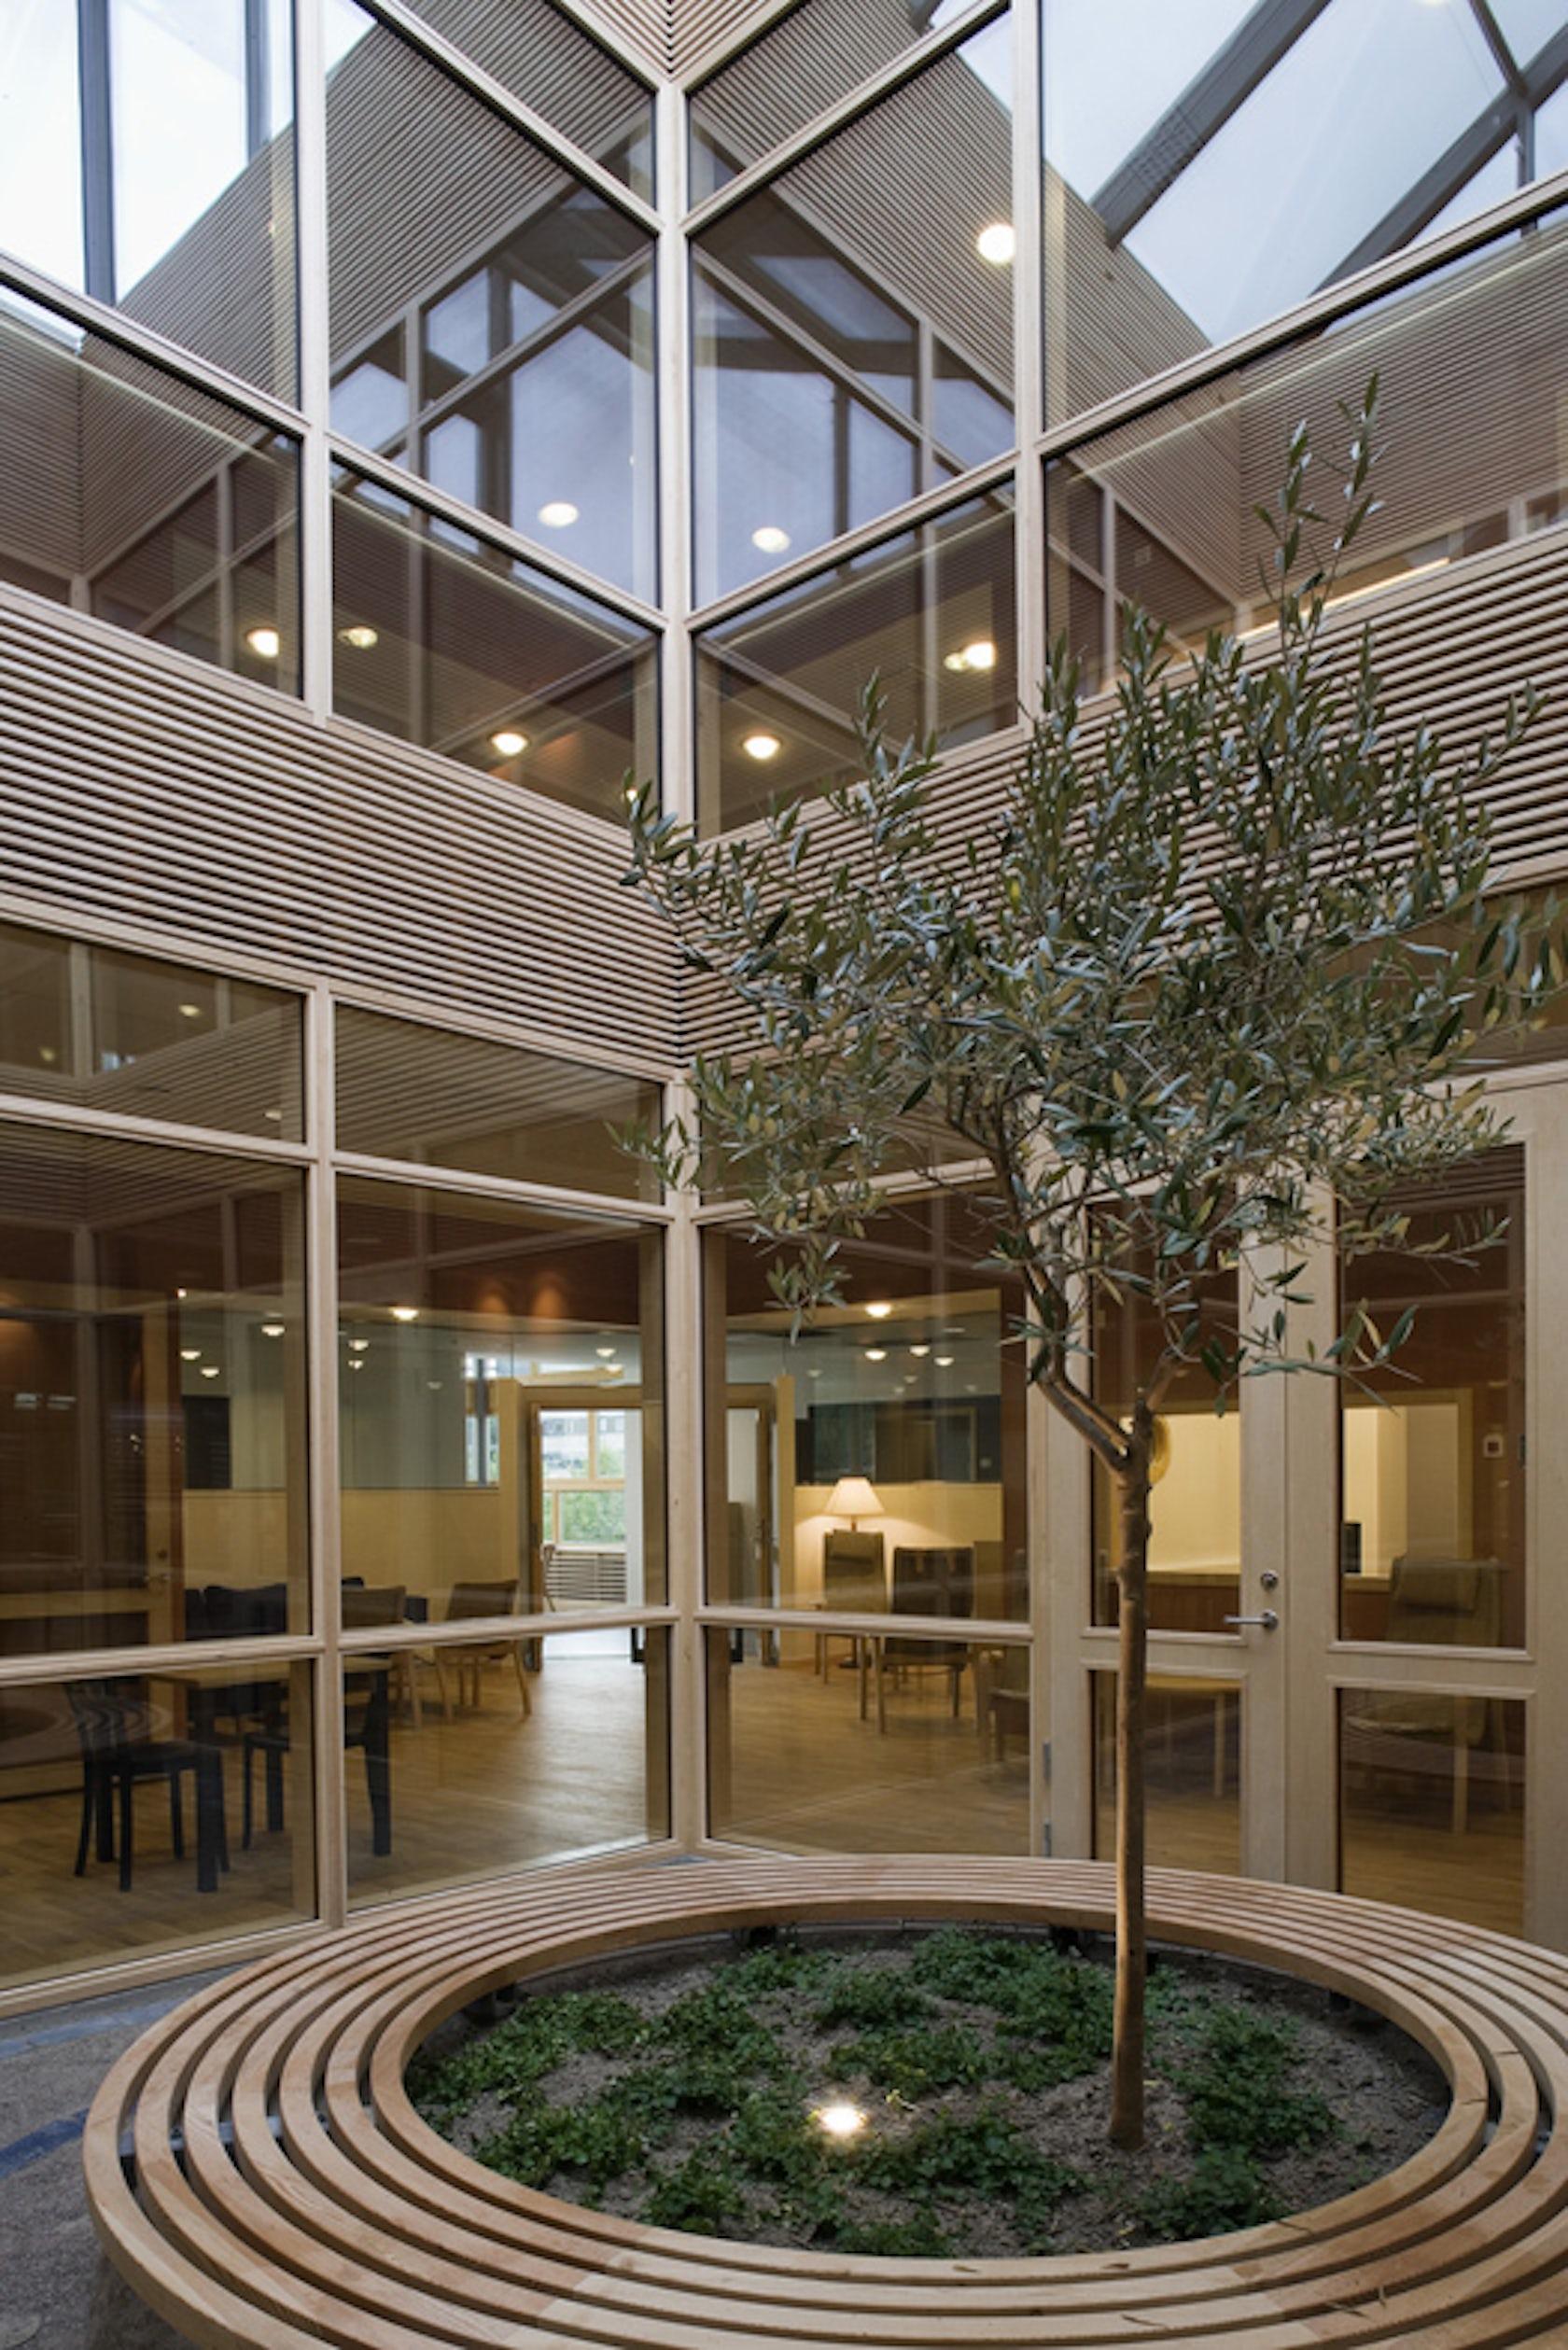 Östra Psychiatry Hospital on Architizer